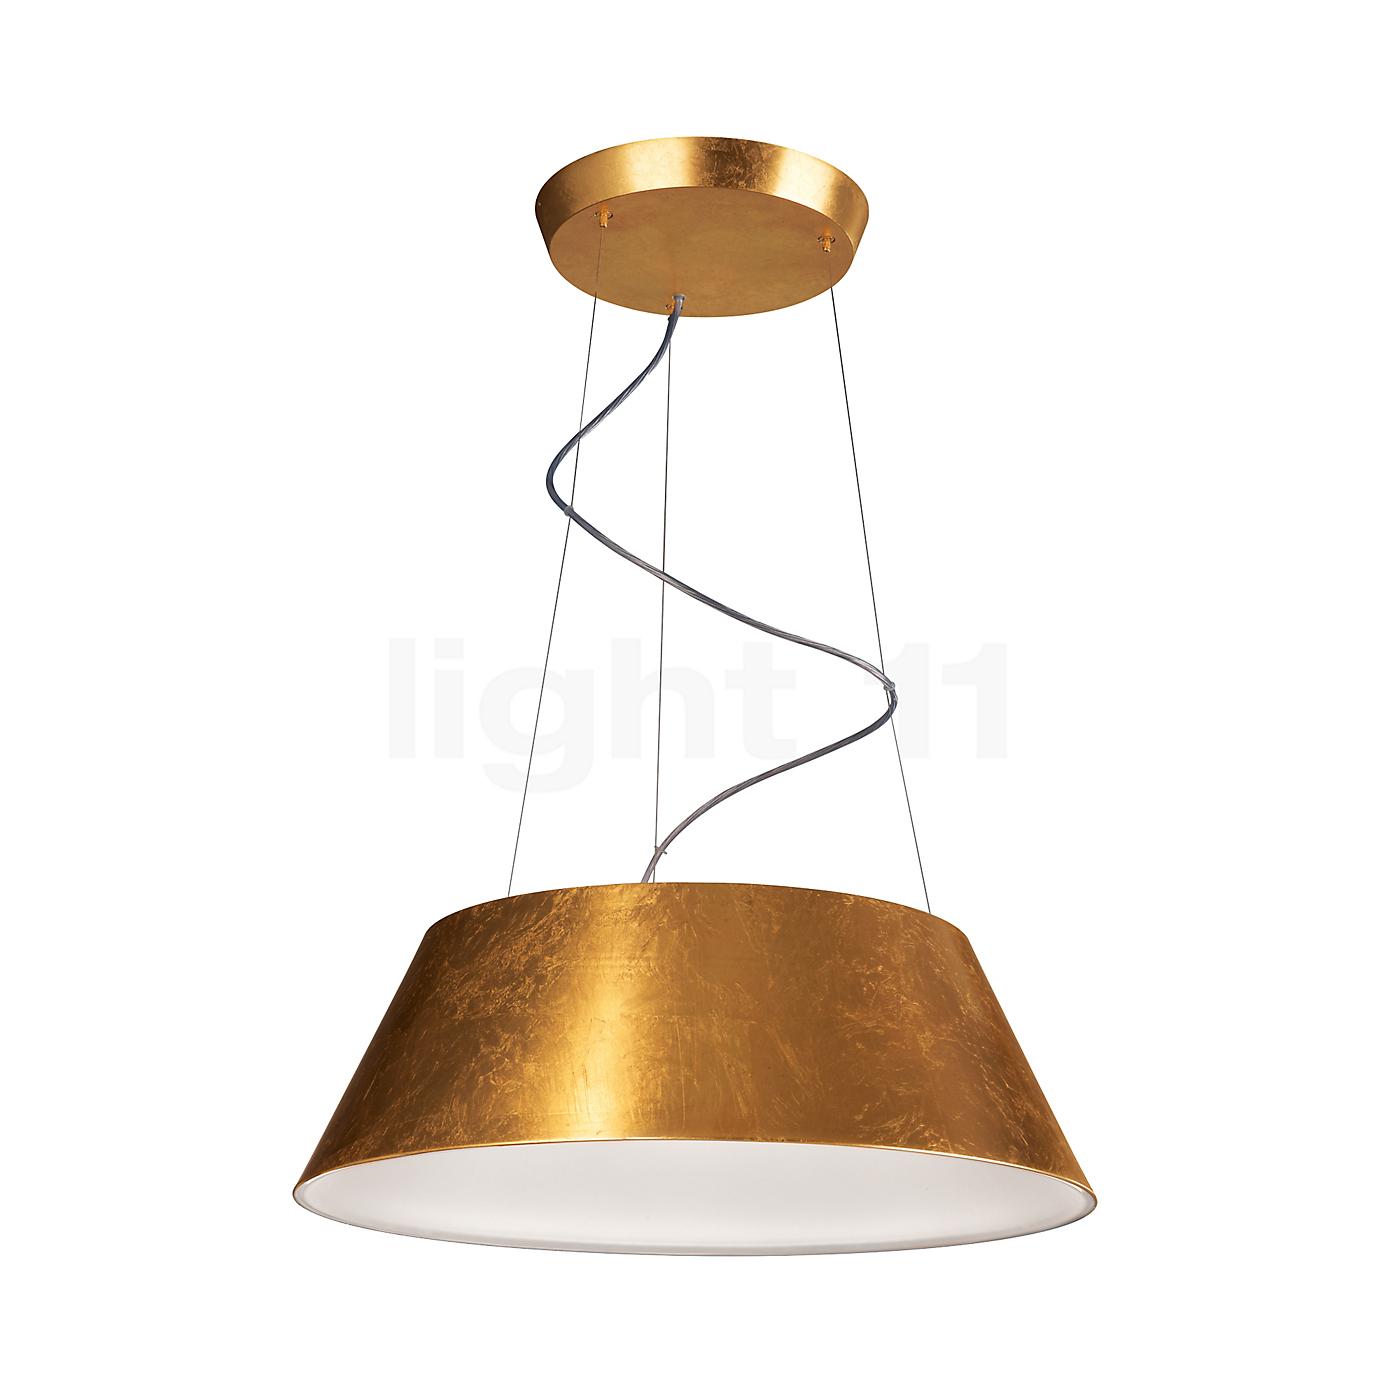 montare lampadario : Lampadario Sospensione Lampada Vetro Soffiato A Bocca Lampadari ...